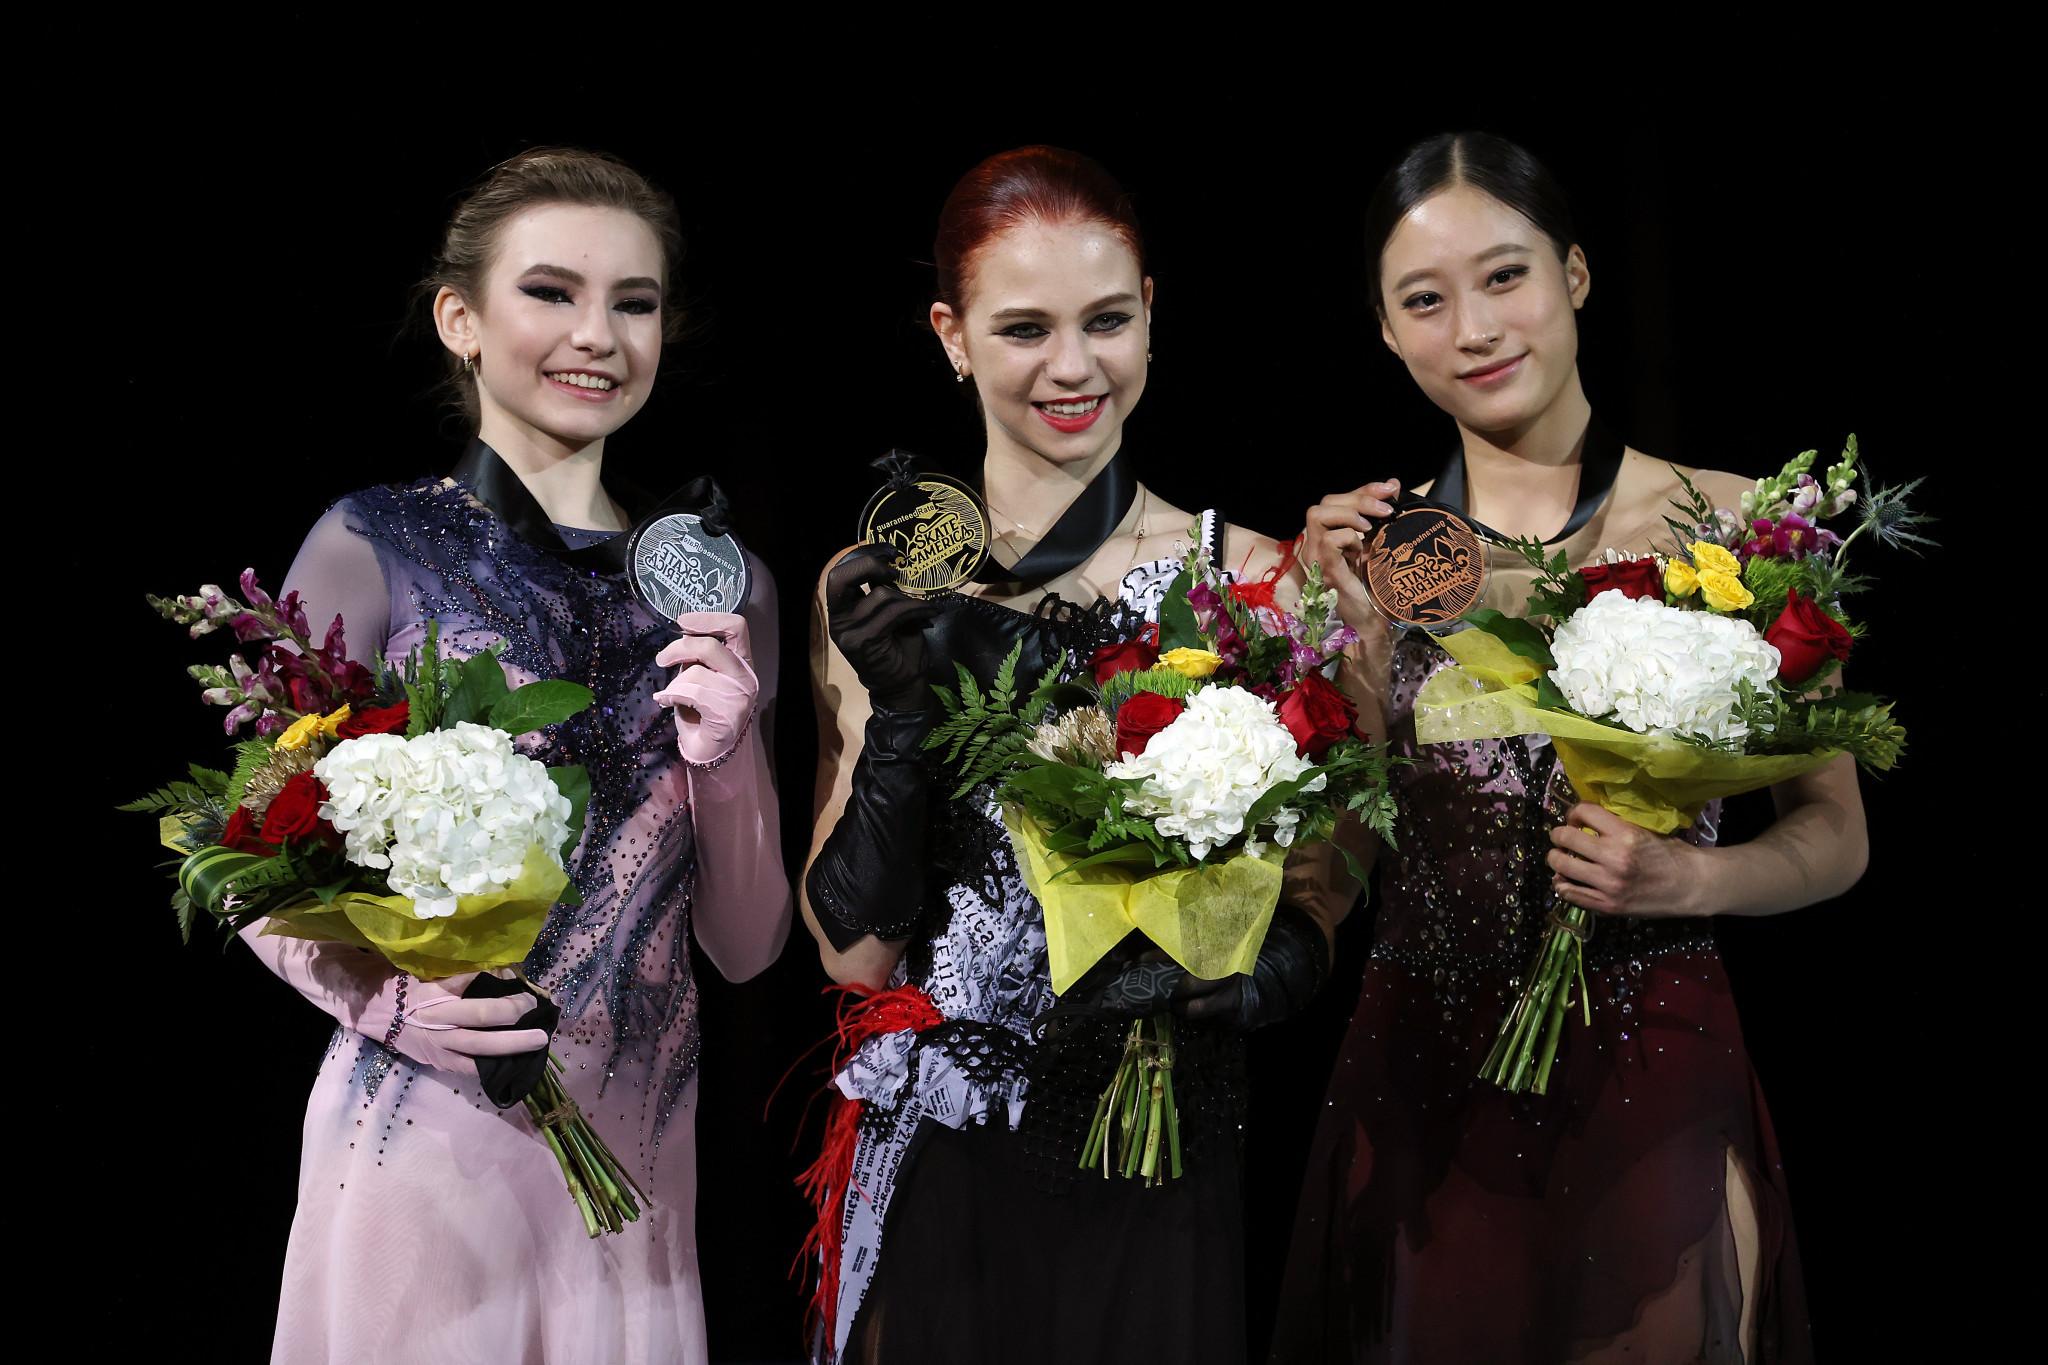 Trusova overcomes foot injury to clinch Skate America crown